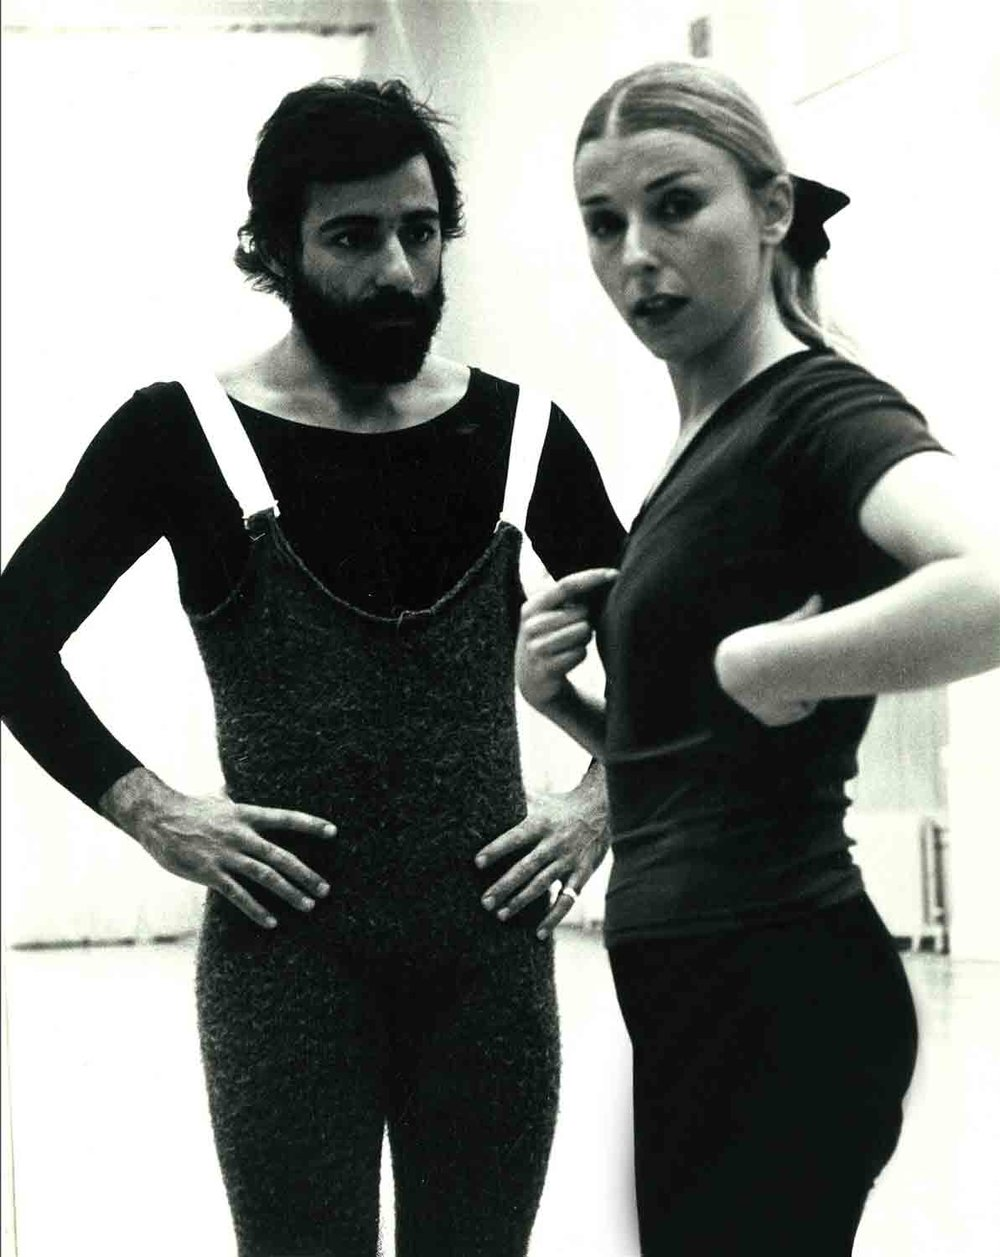 Rolando-Peña_03_Dance-Theater_Phyllis-Lamhut-Dance-Company_1_1969.jpg